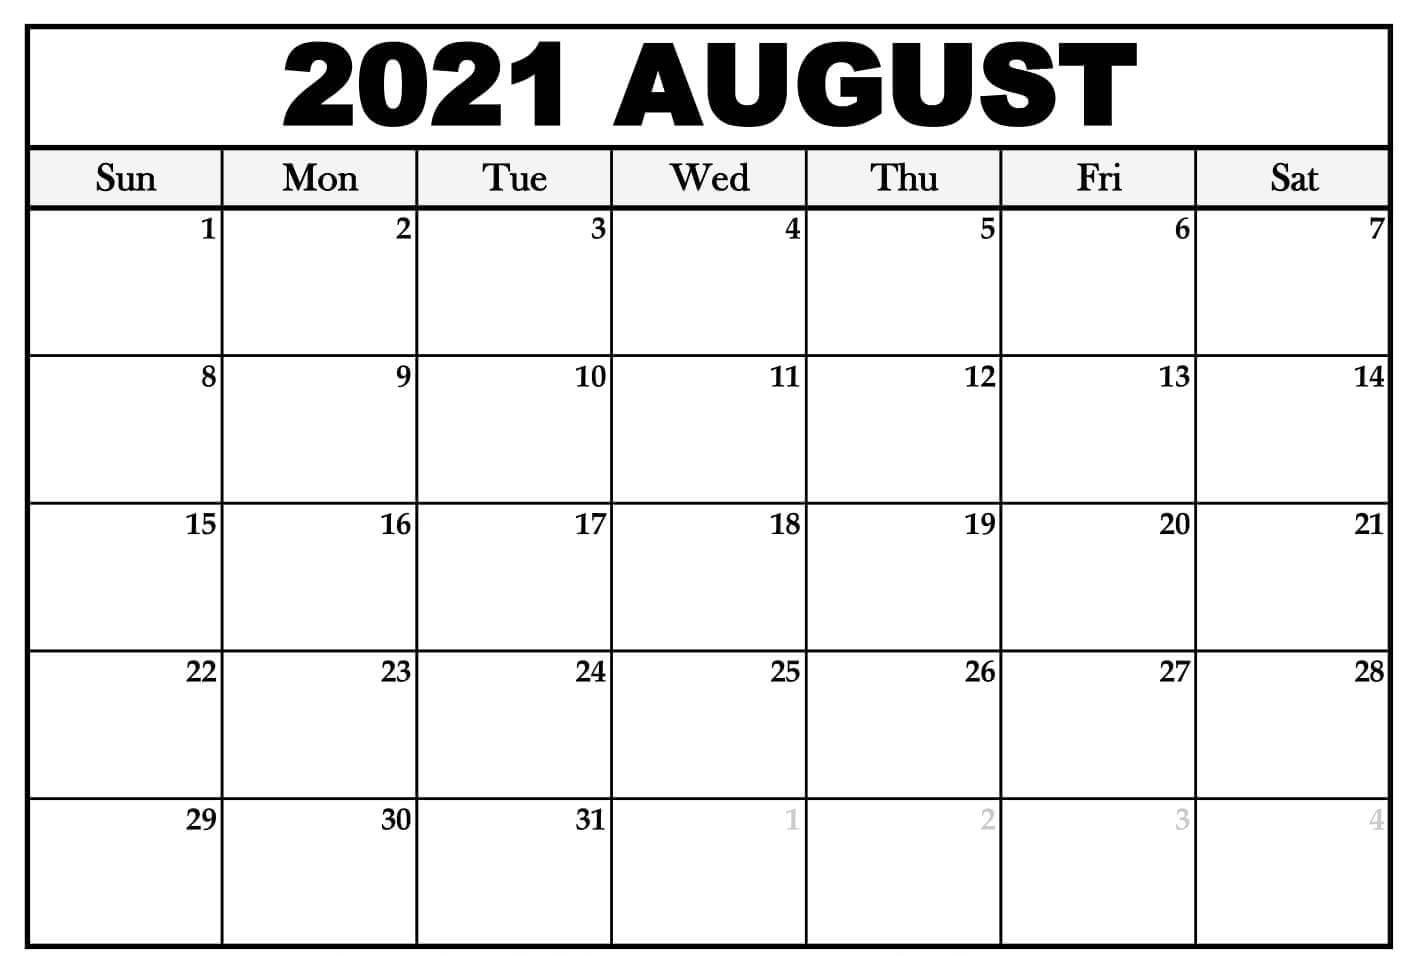 2021 August Blank Calendar Pdf